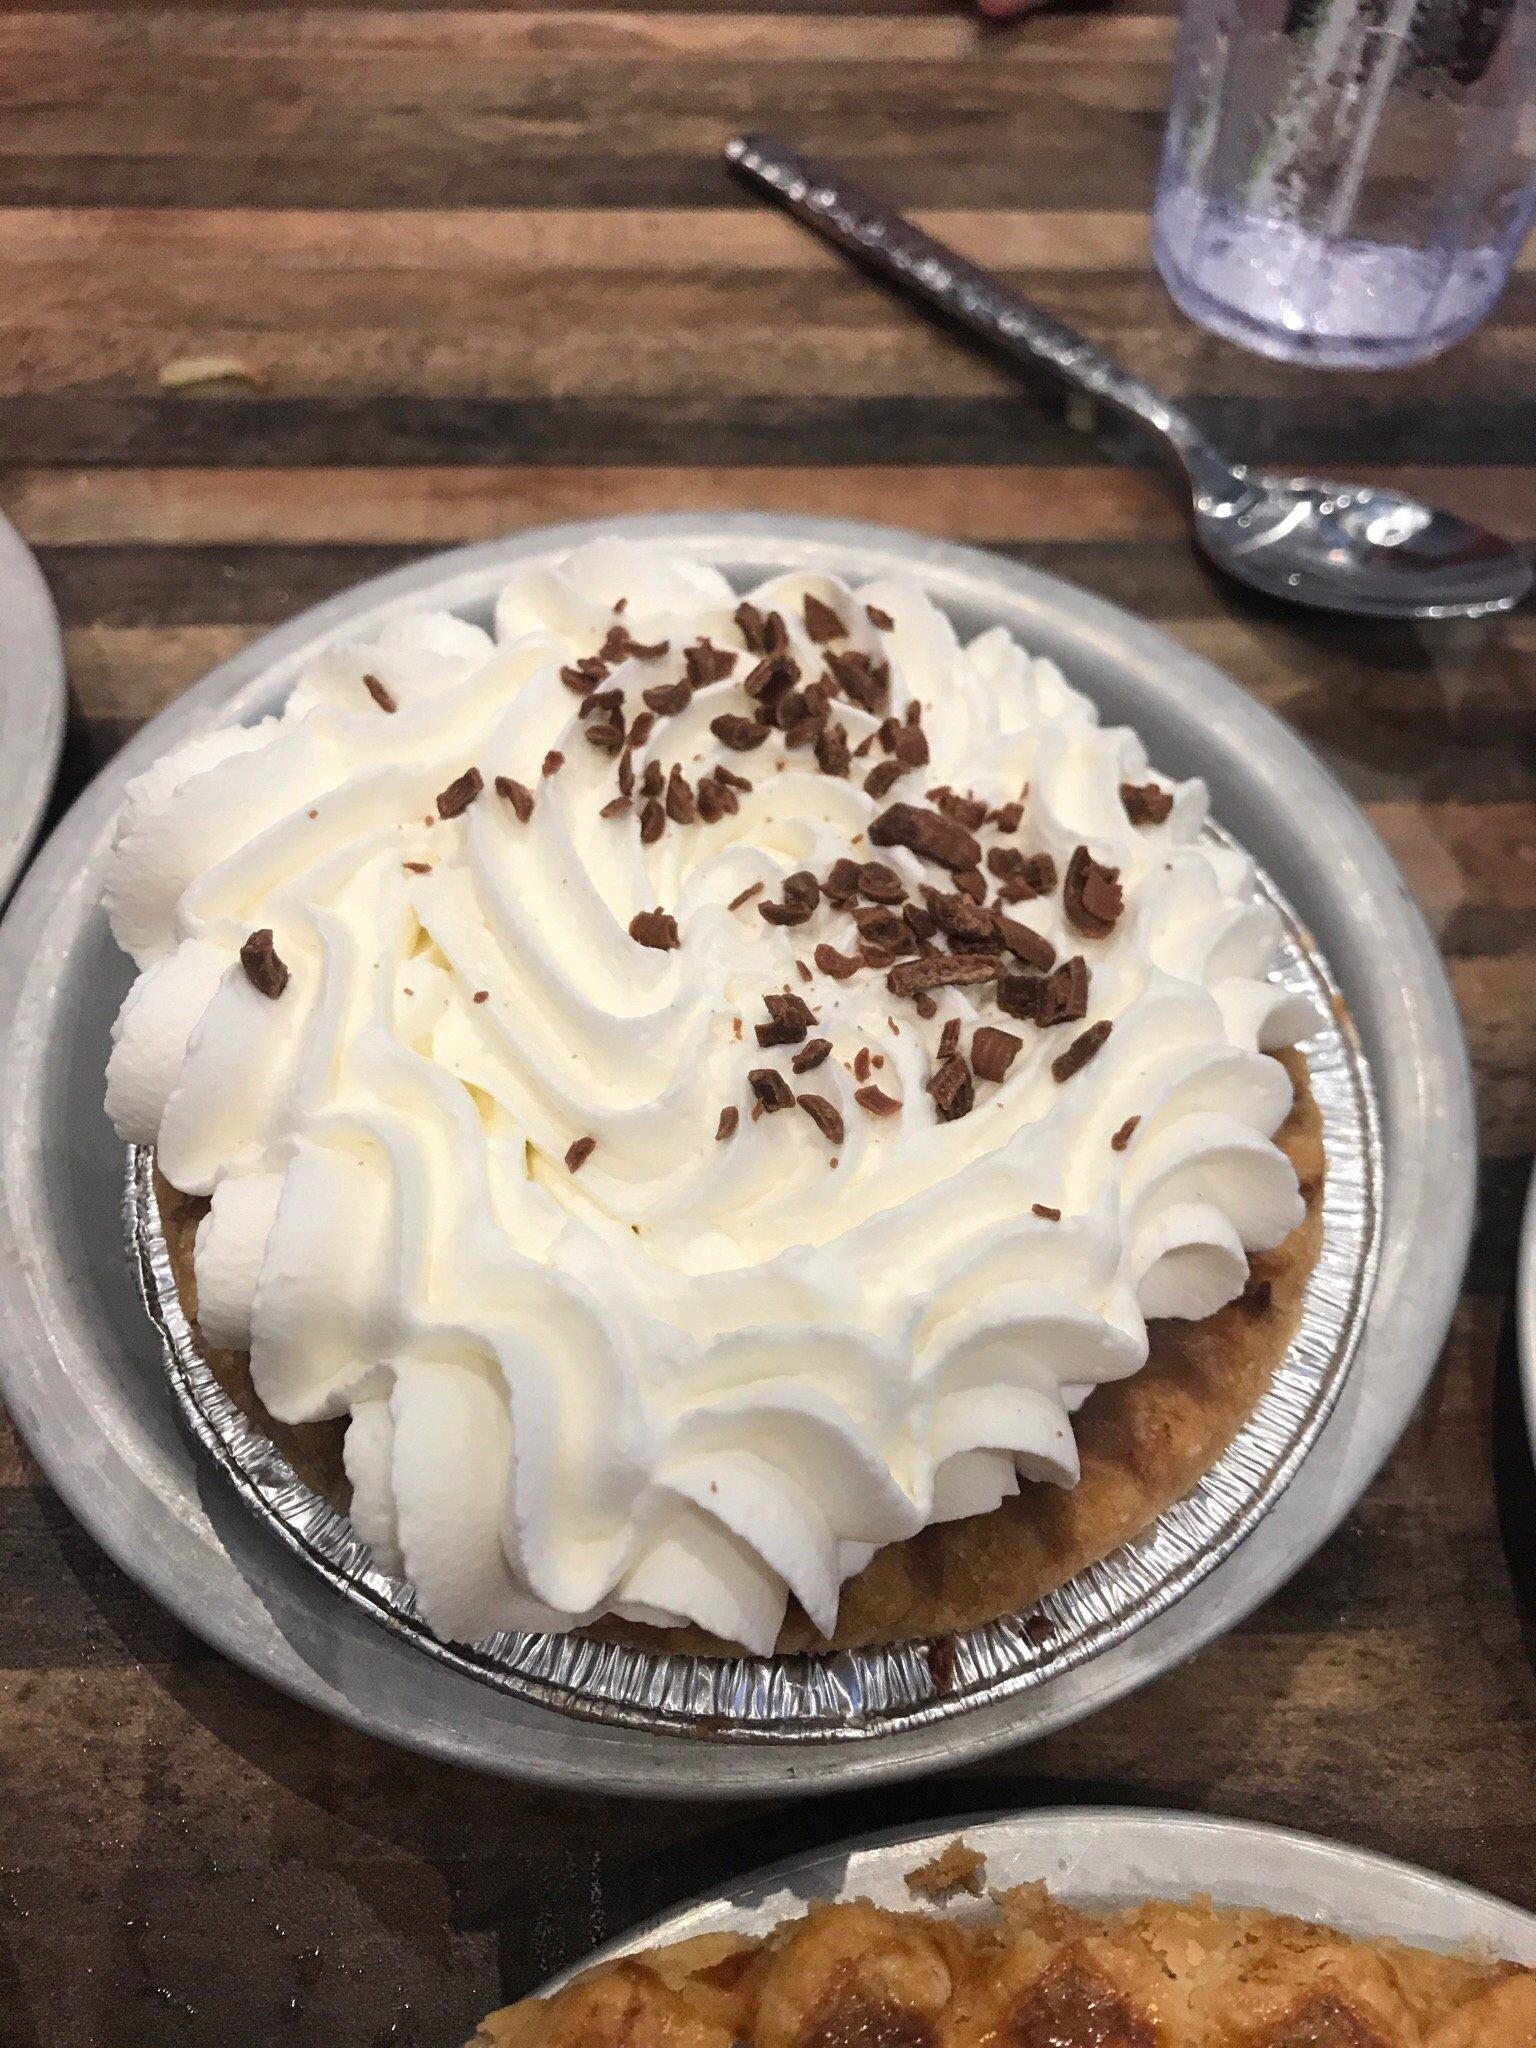 House Of Pies, Houston   11311 Fuqua St   Restaurant Reviews, Phone Number  U0026 Photos   TripAdvisor